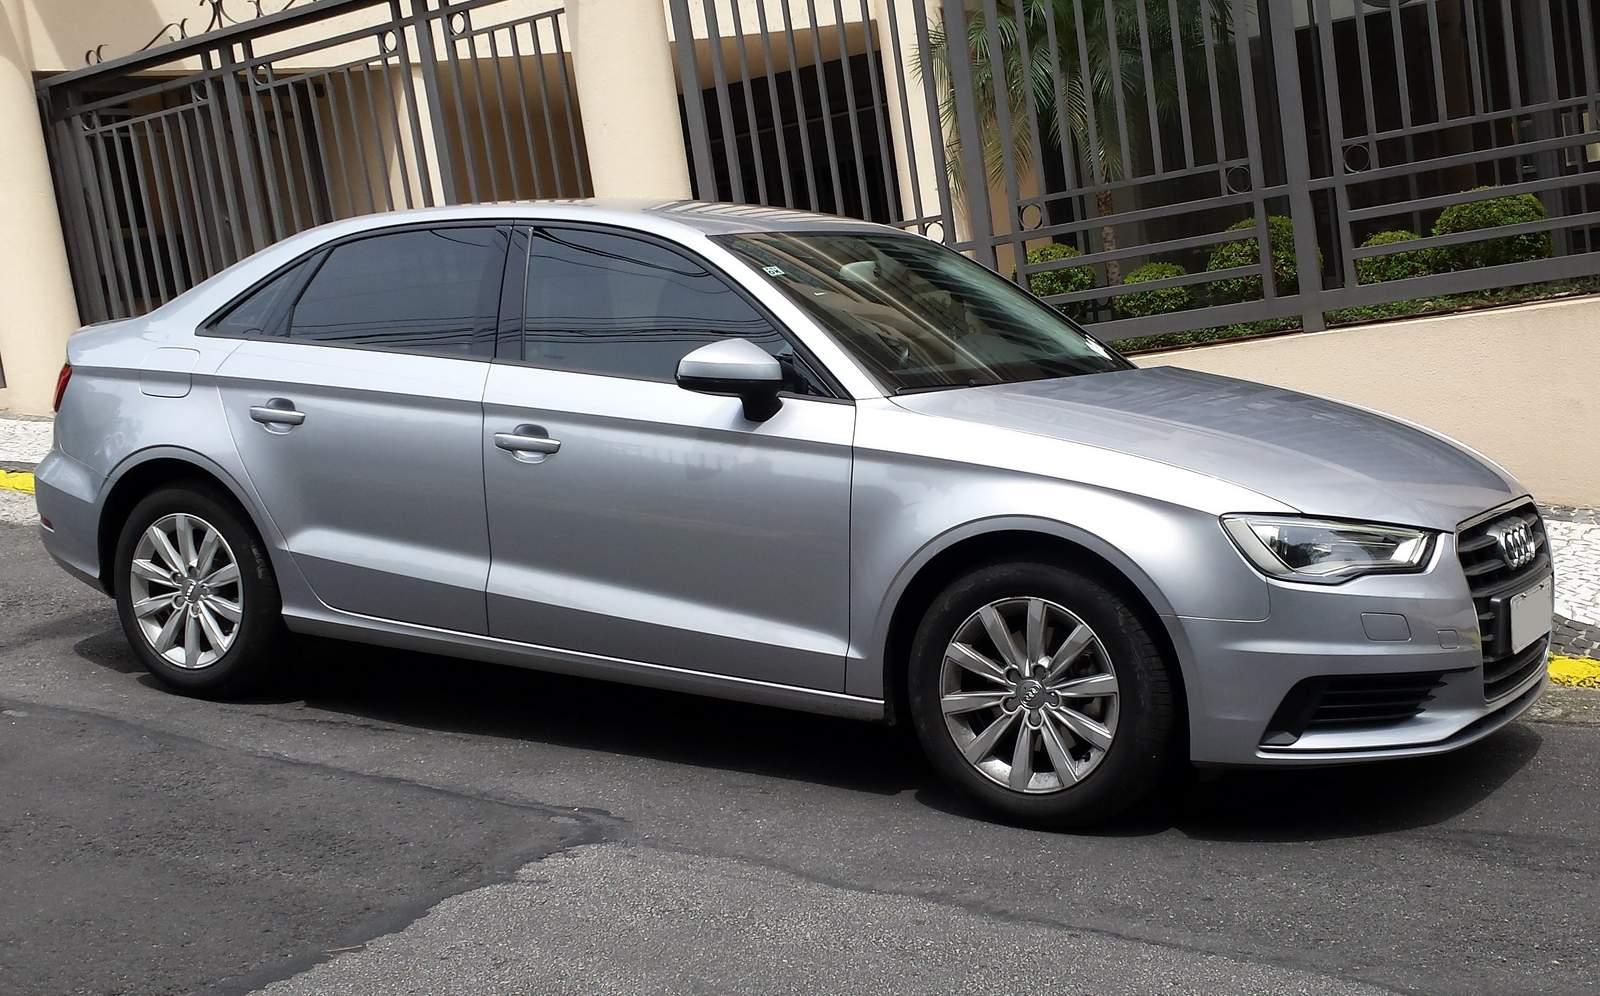 audi a3 sedan 1.4 tfsi attraction 2015: avaliação completa | car